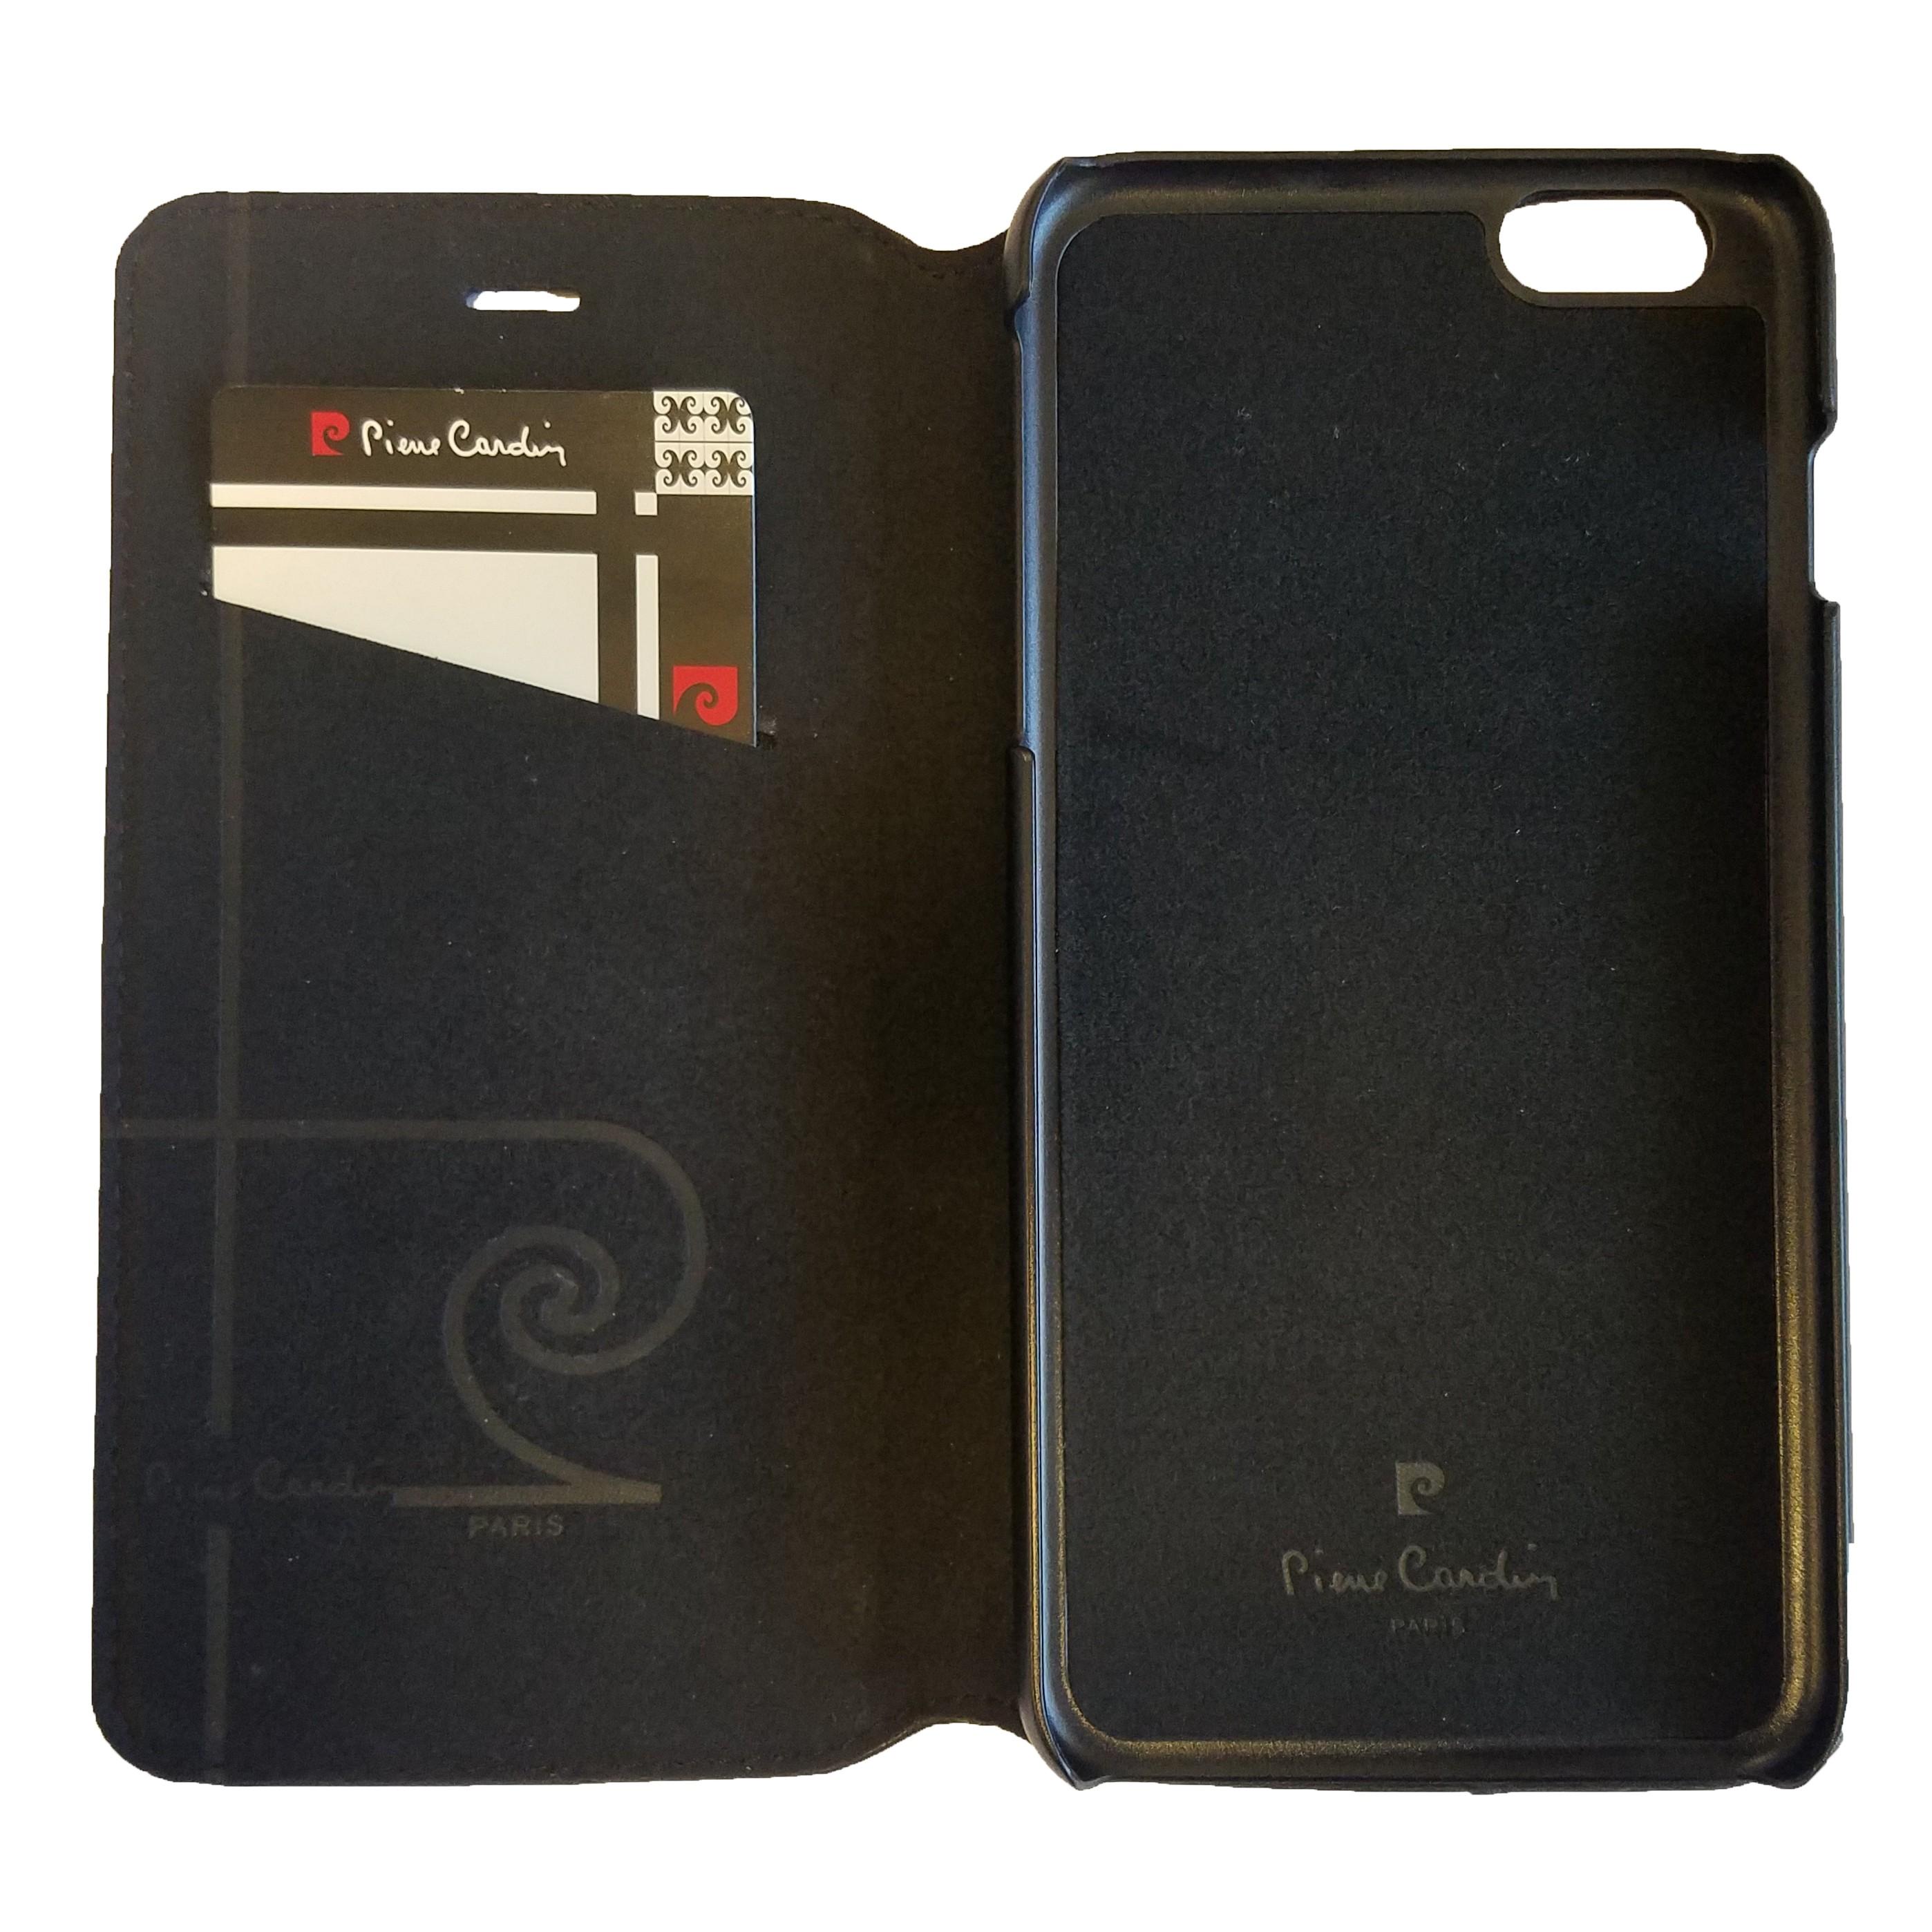 pierre cardin genuine leather iphone 6 6s plus flip case. Black Bedroom Furniture Sets. Home Design Ideas